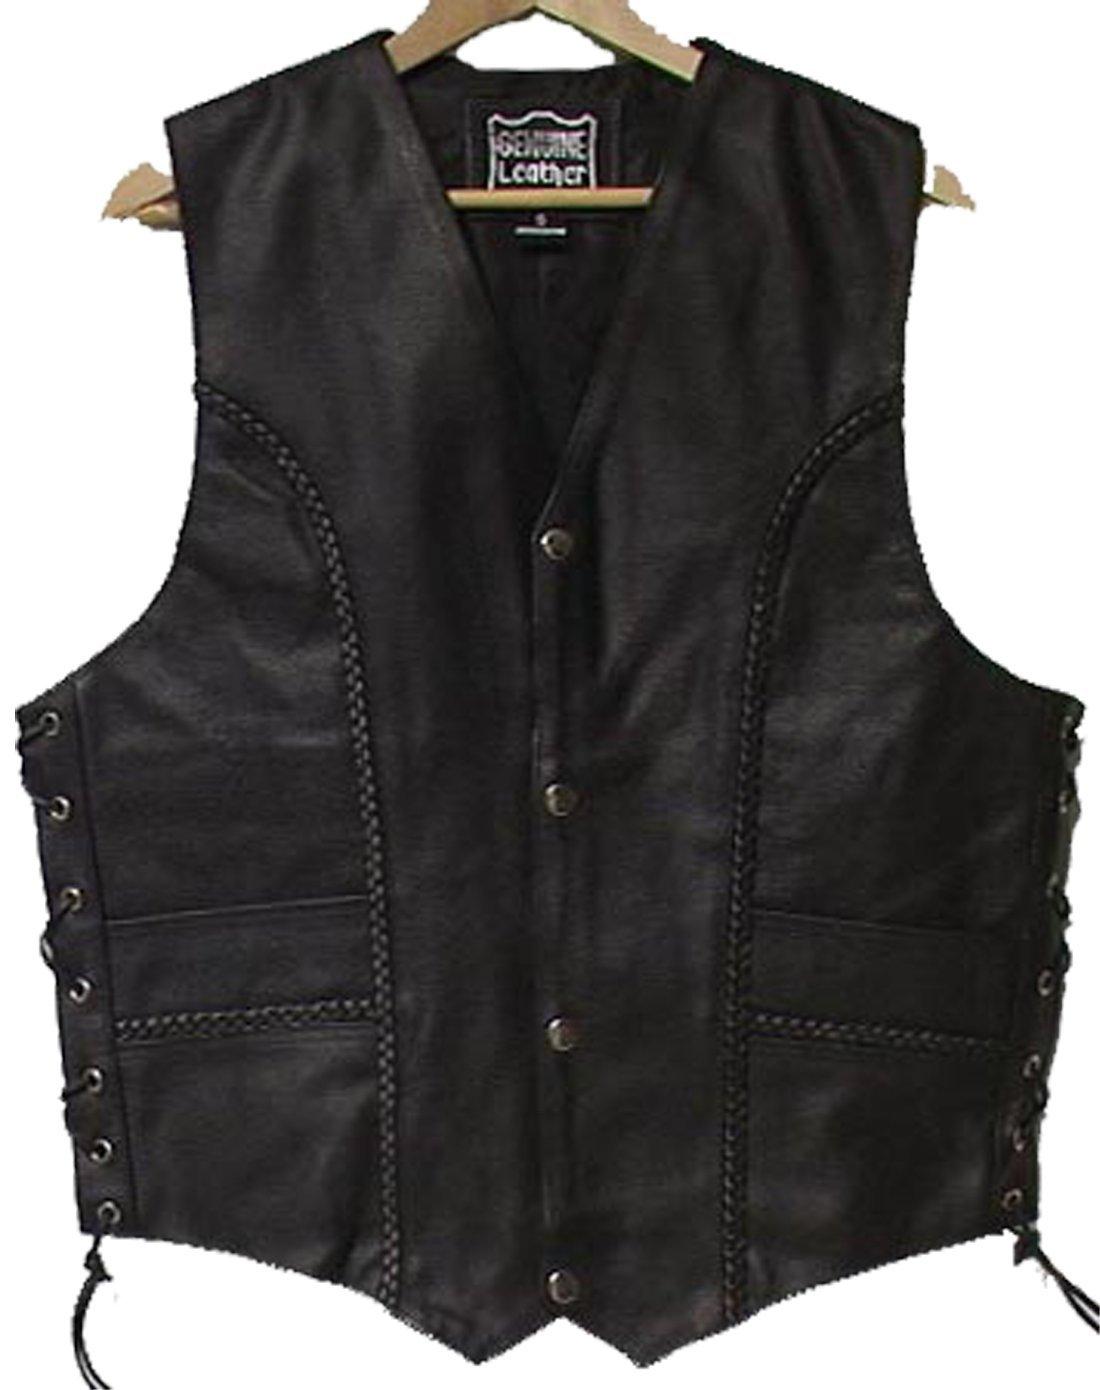 Genuine Cowhide Leather Biker's Vest Black # 9692 (2XL) IGI Canada